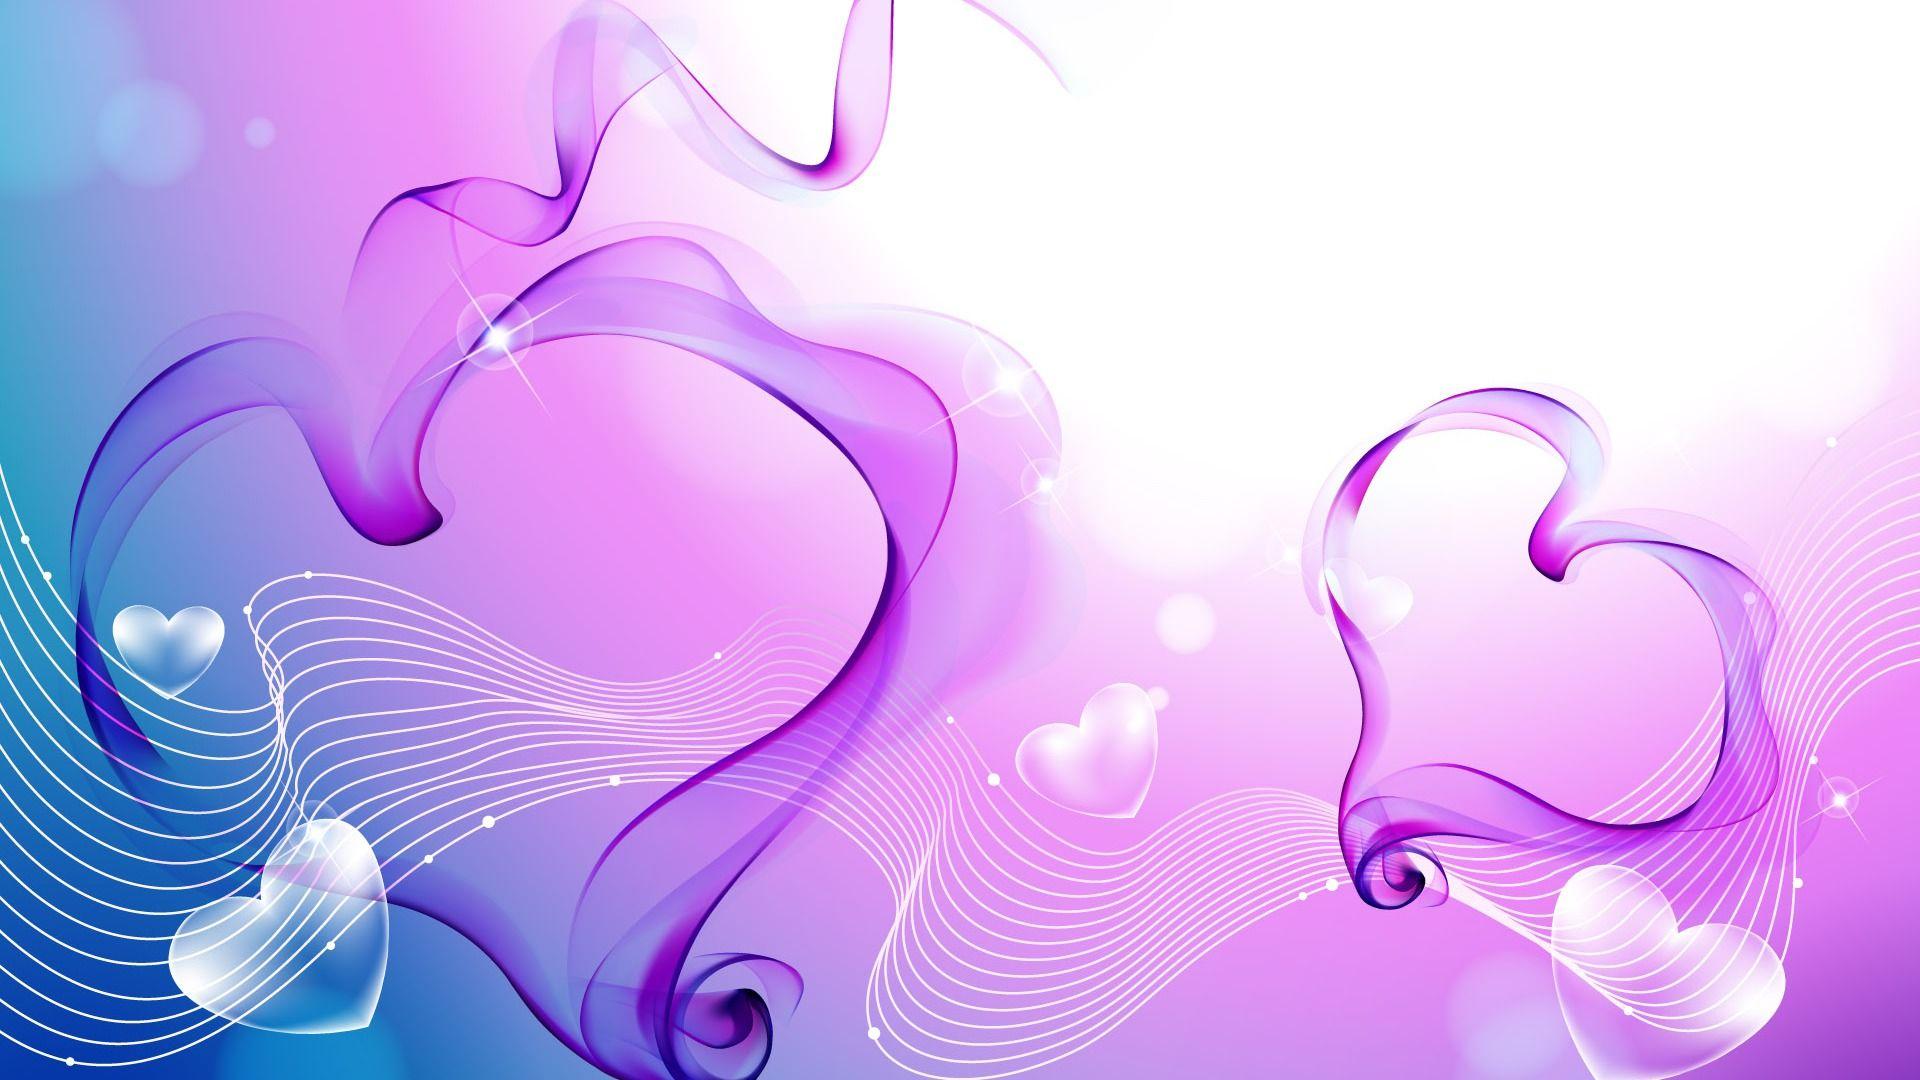 Abstract Love Wallpaper WallDevil